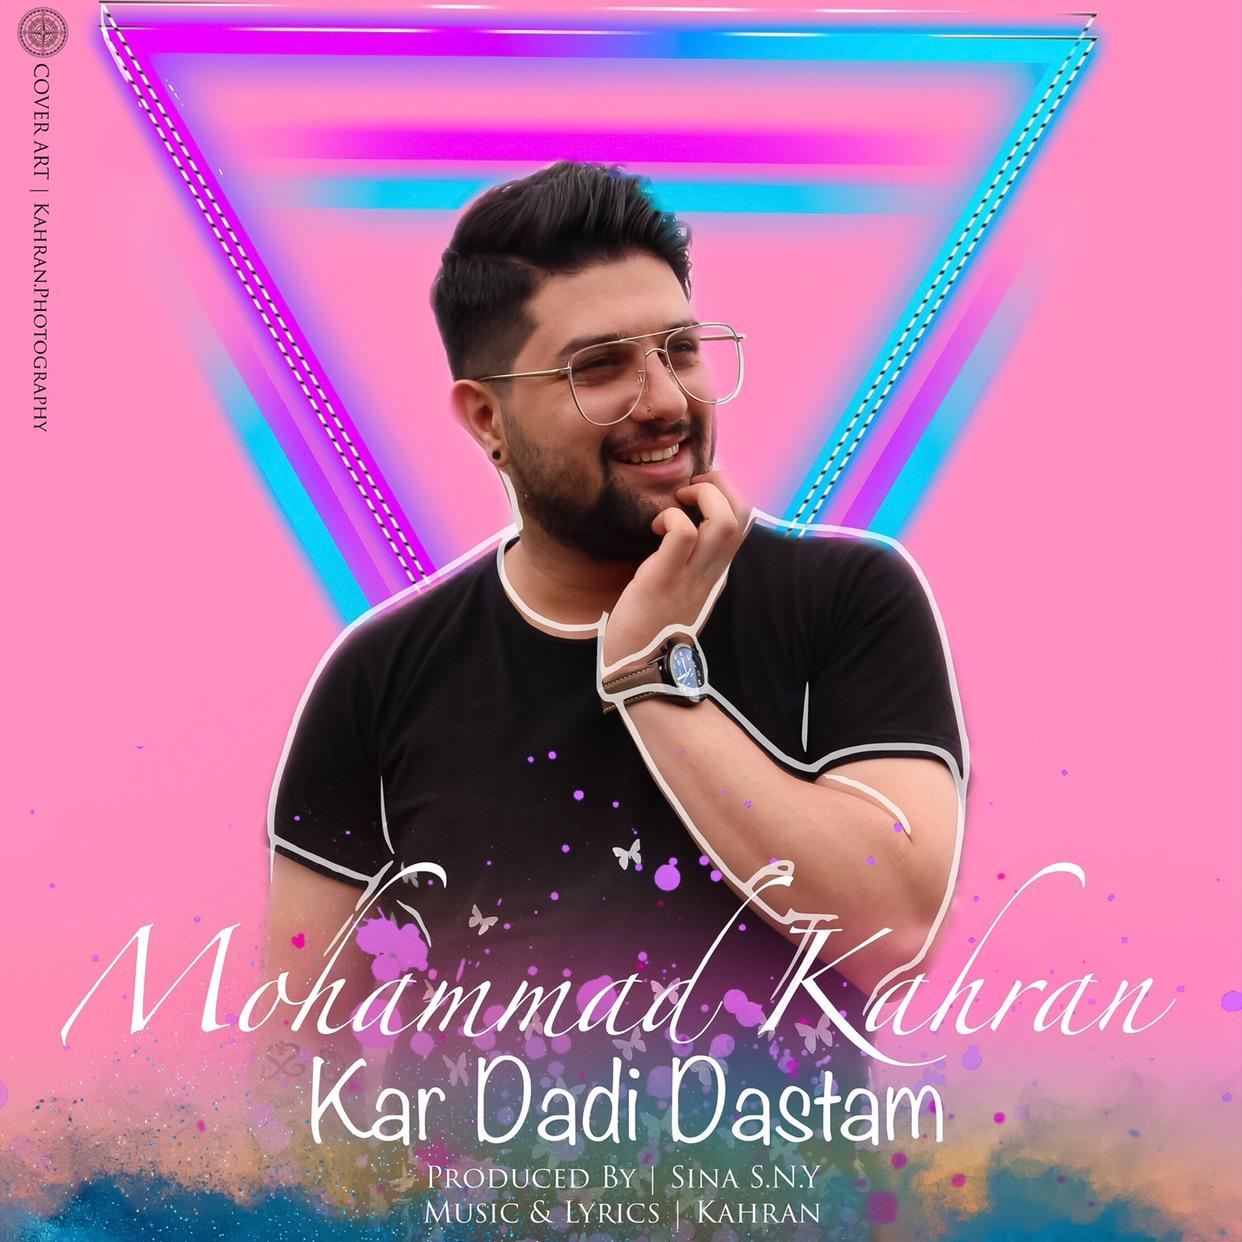 Mohammad Kahran – Kar Dadi Dastam